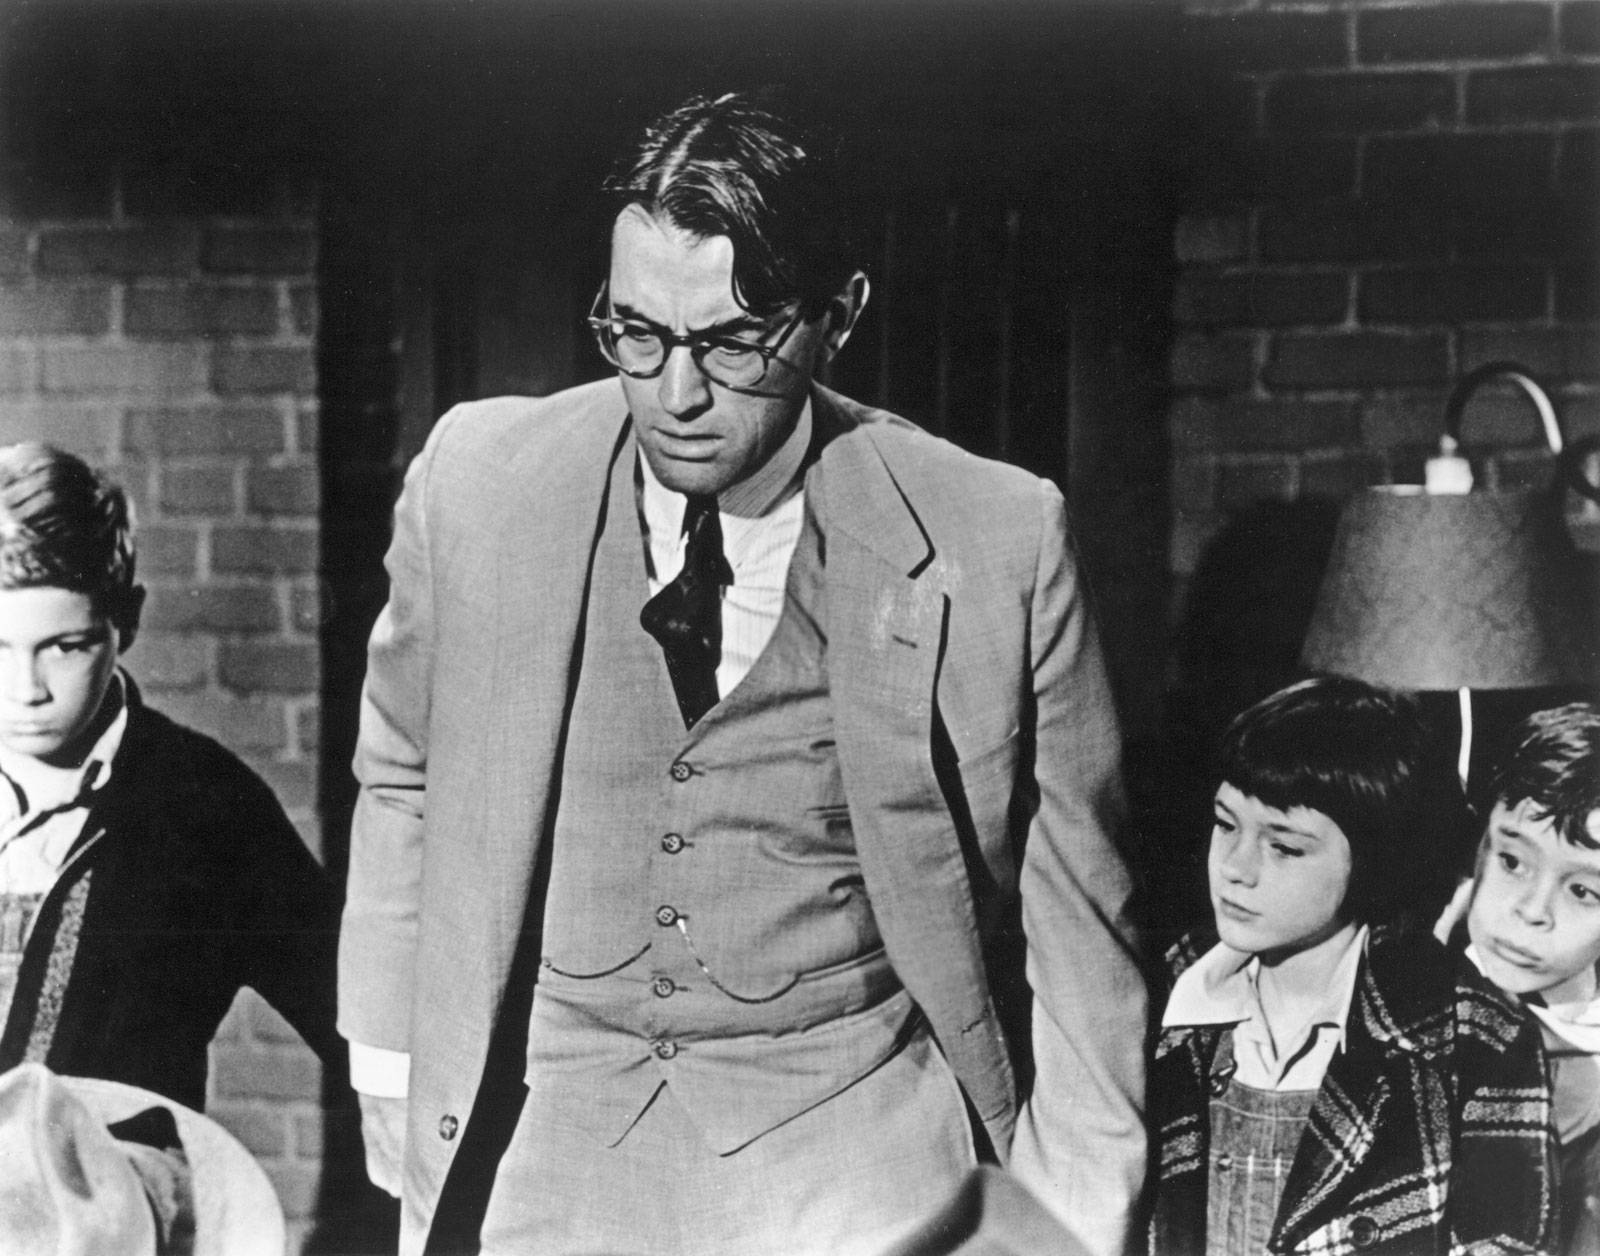 Movie Review: To Kill A Mockingbird (1962) | The Ace Black ...